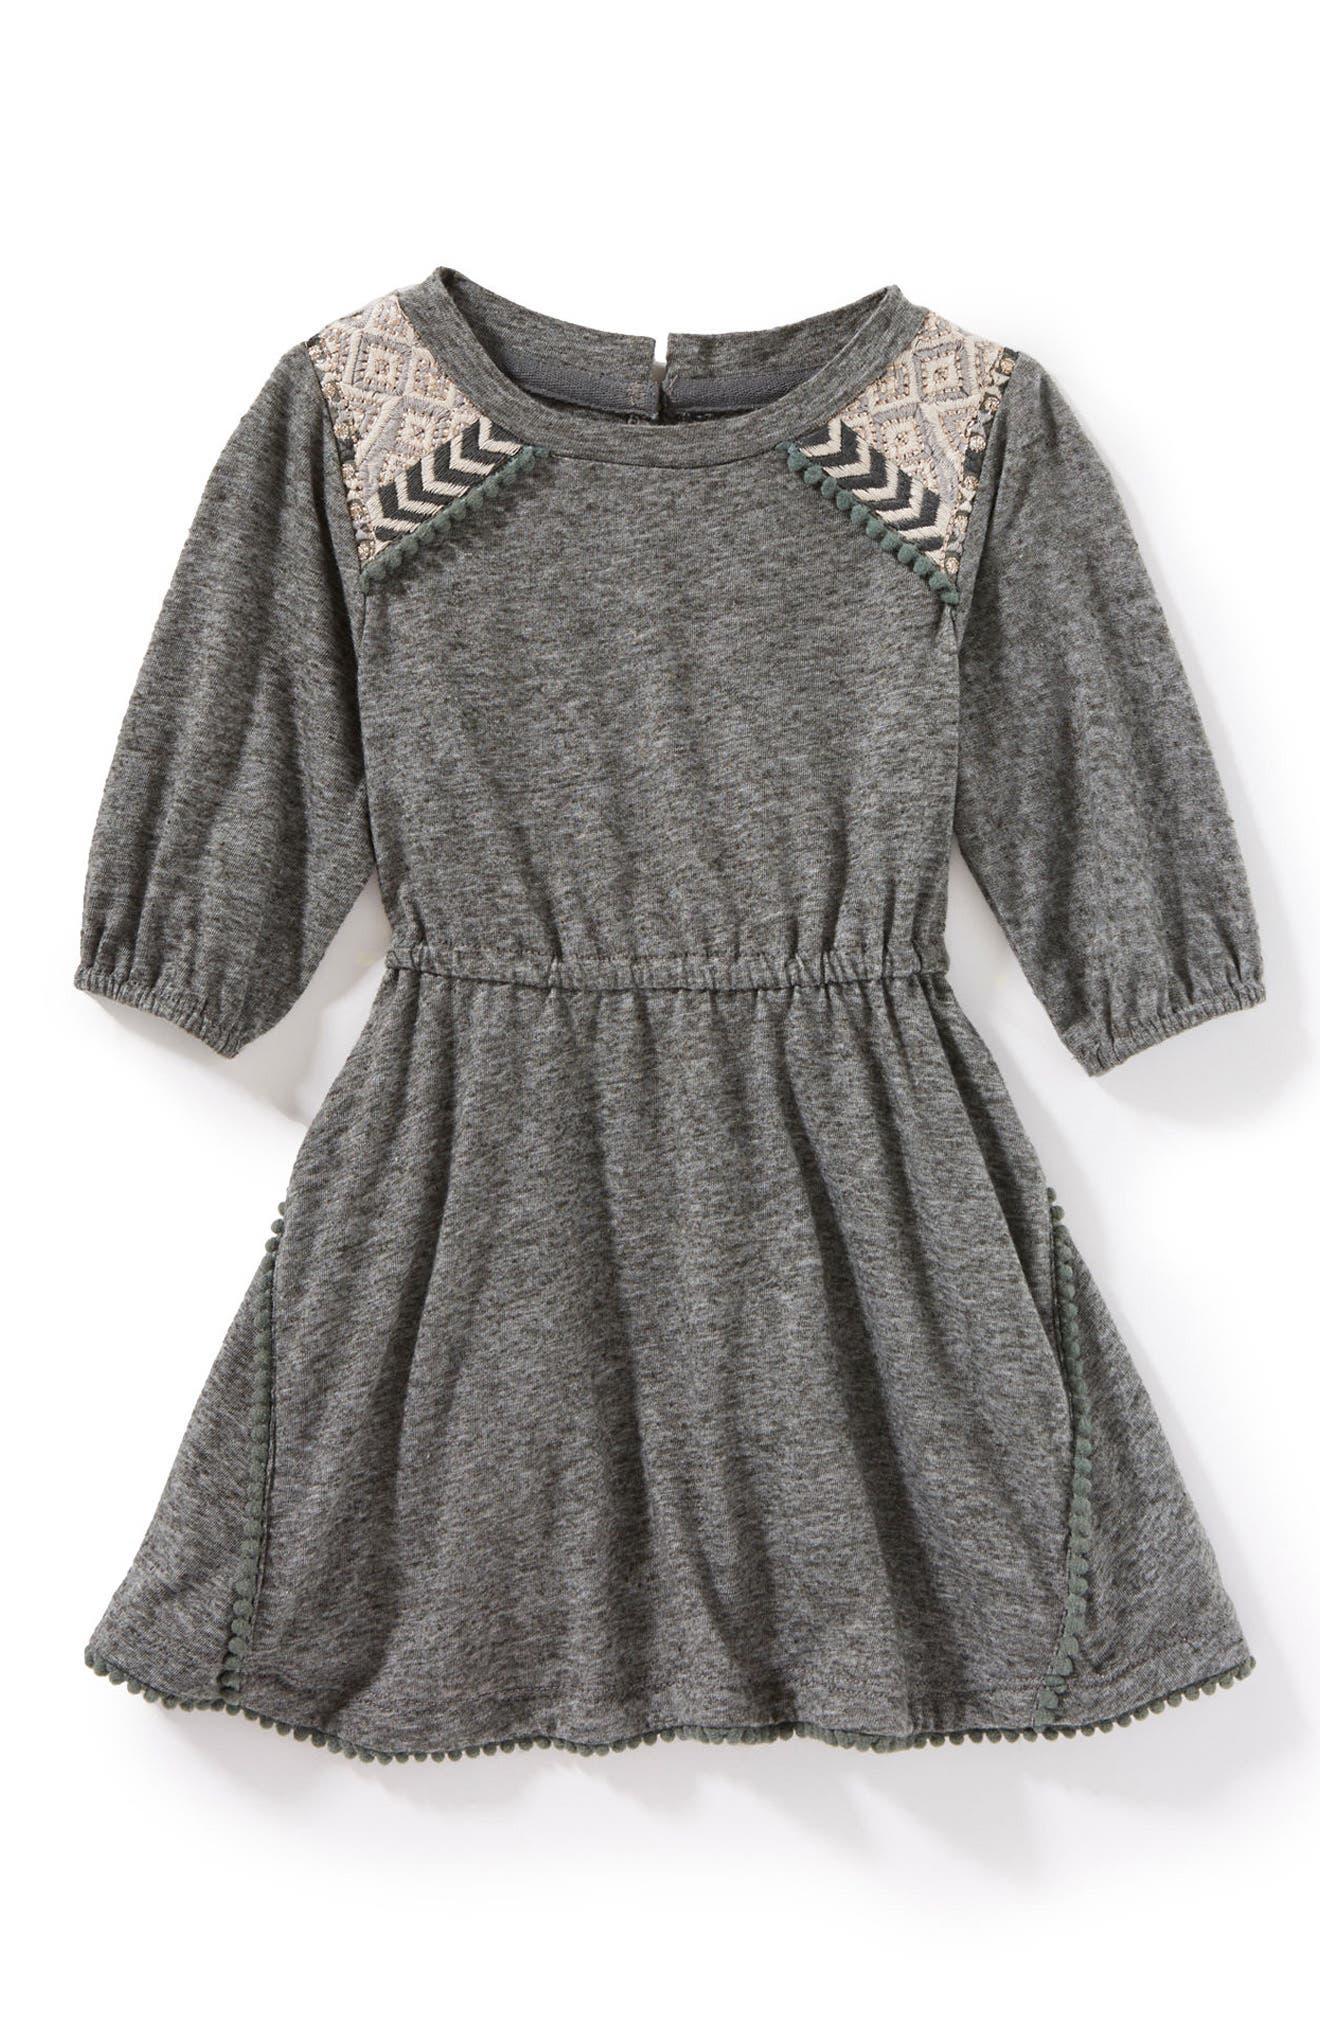 Alternate Image 1 Selected - Peek Lauren Jersey Dress (Baby Girls)